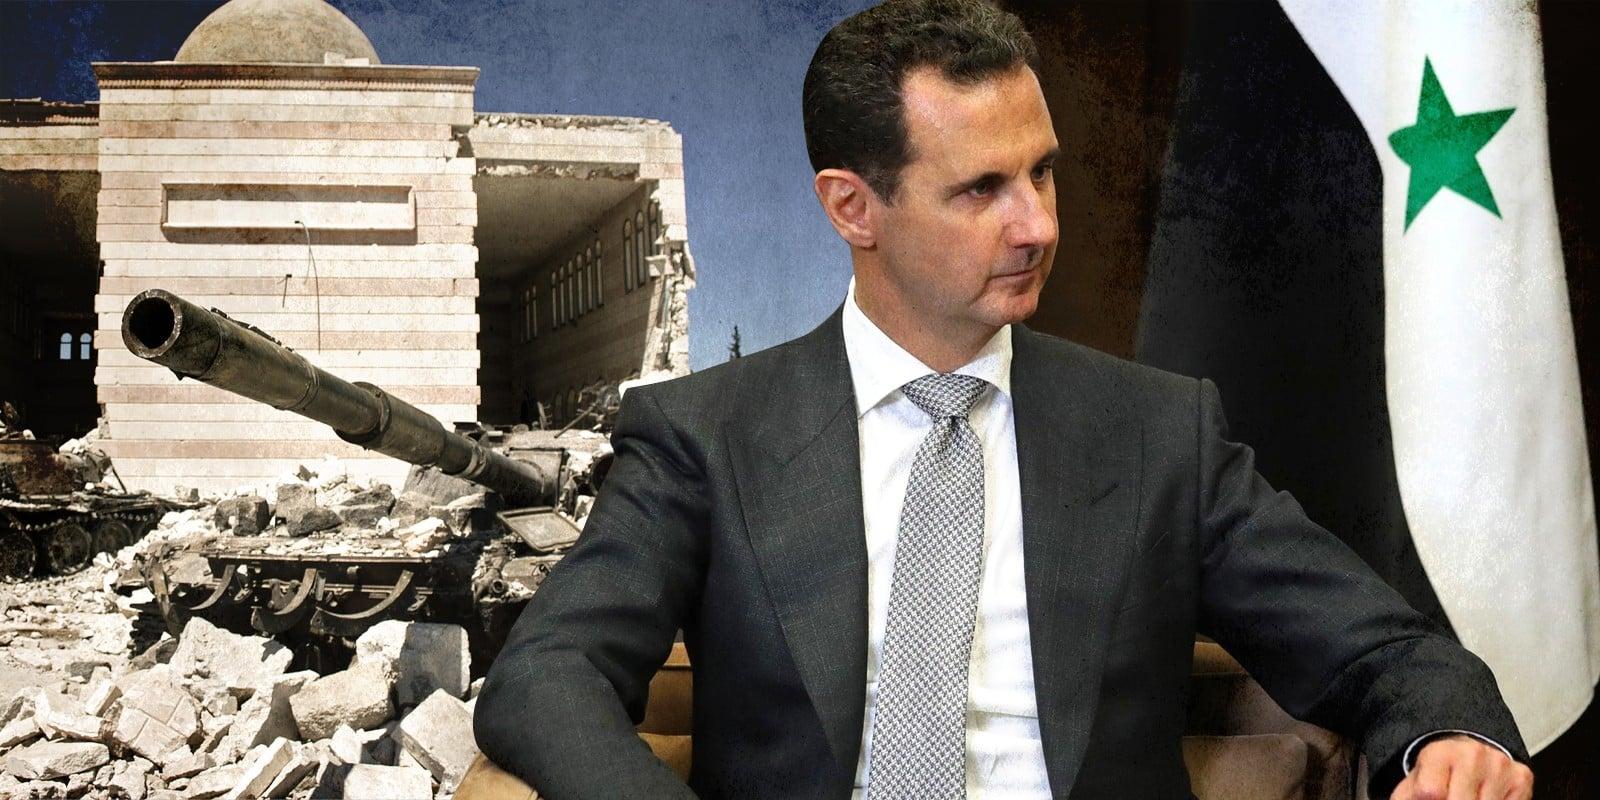 assad and syria illustration